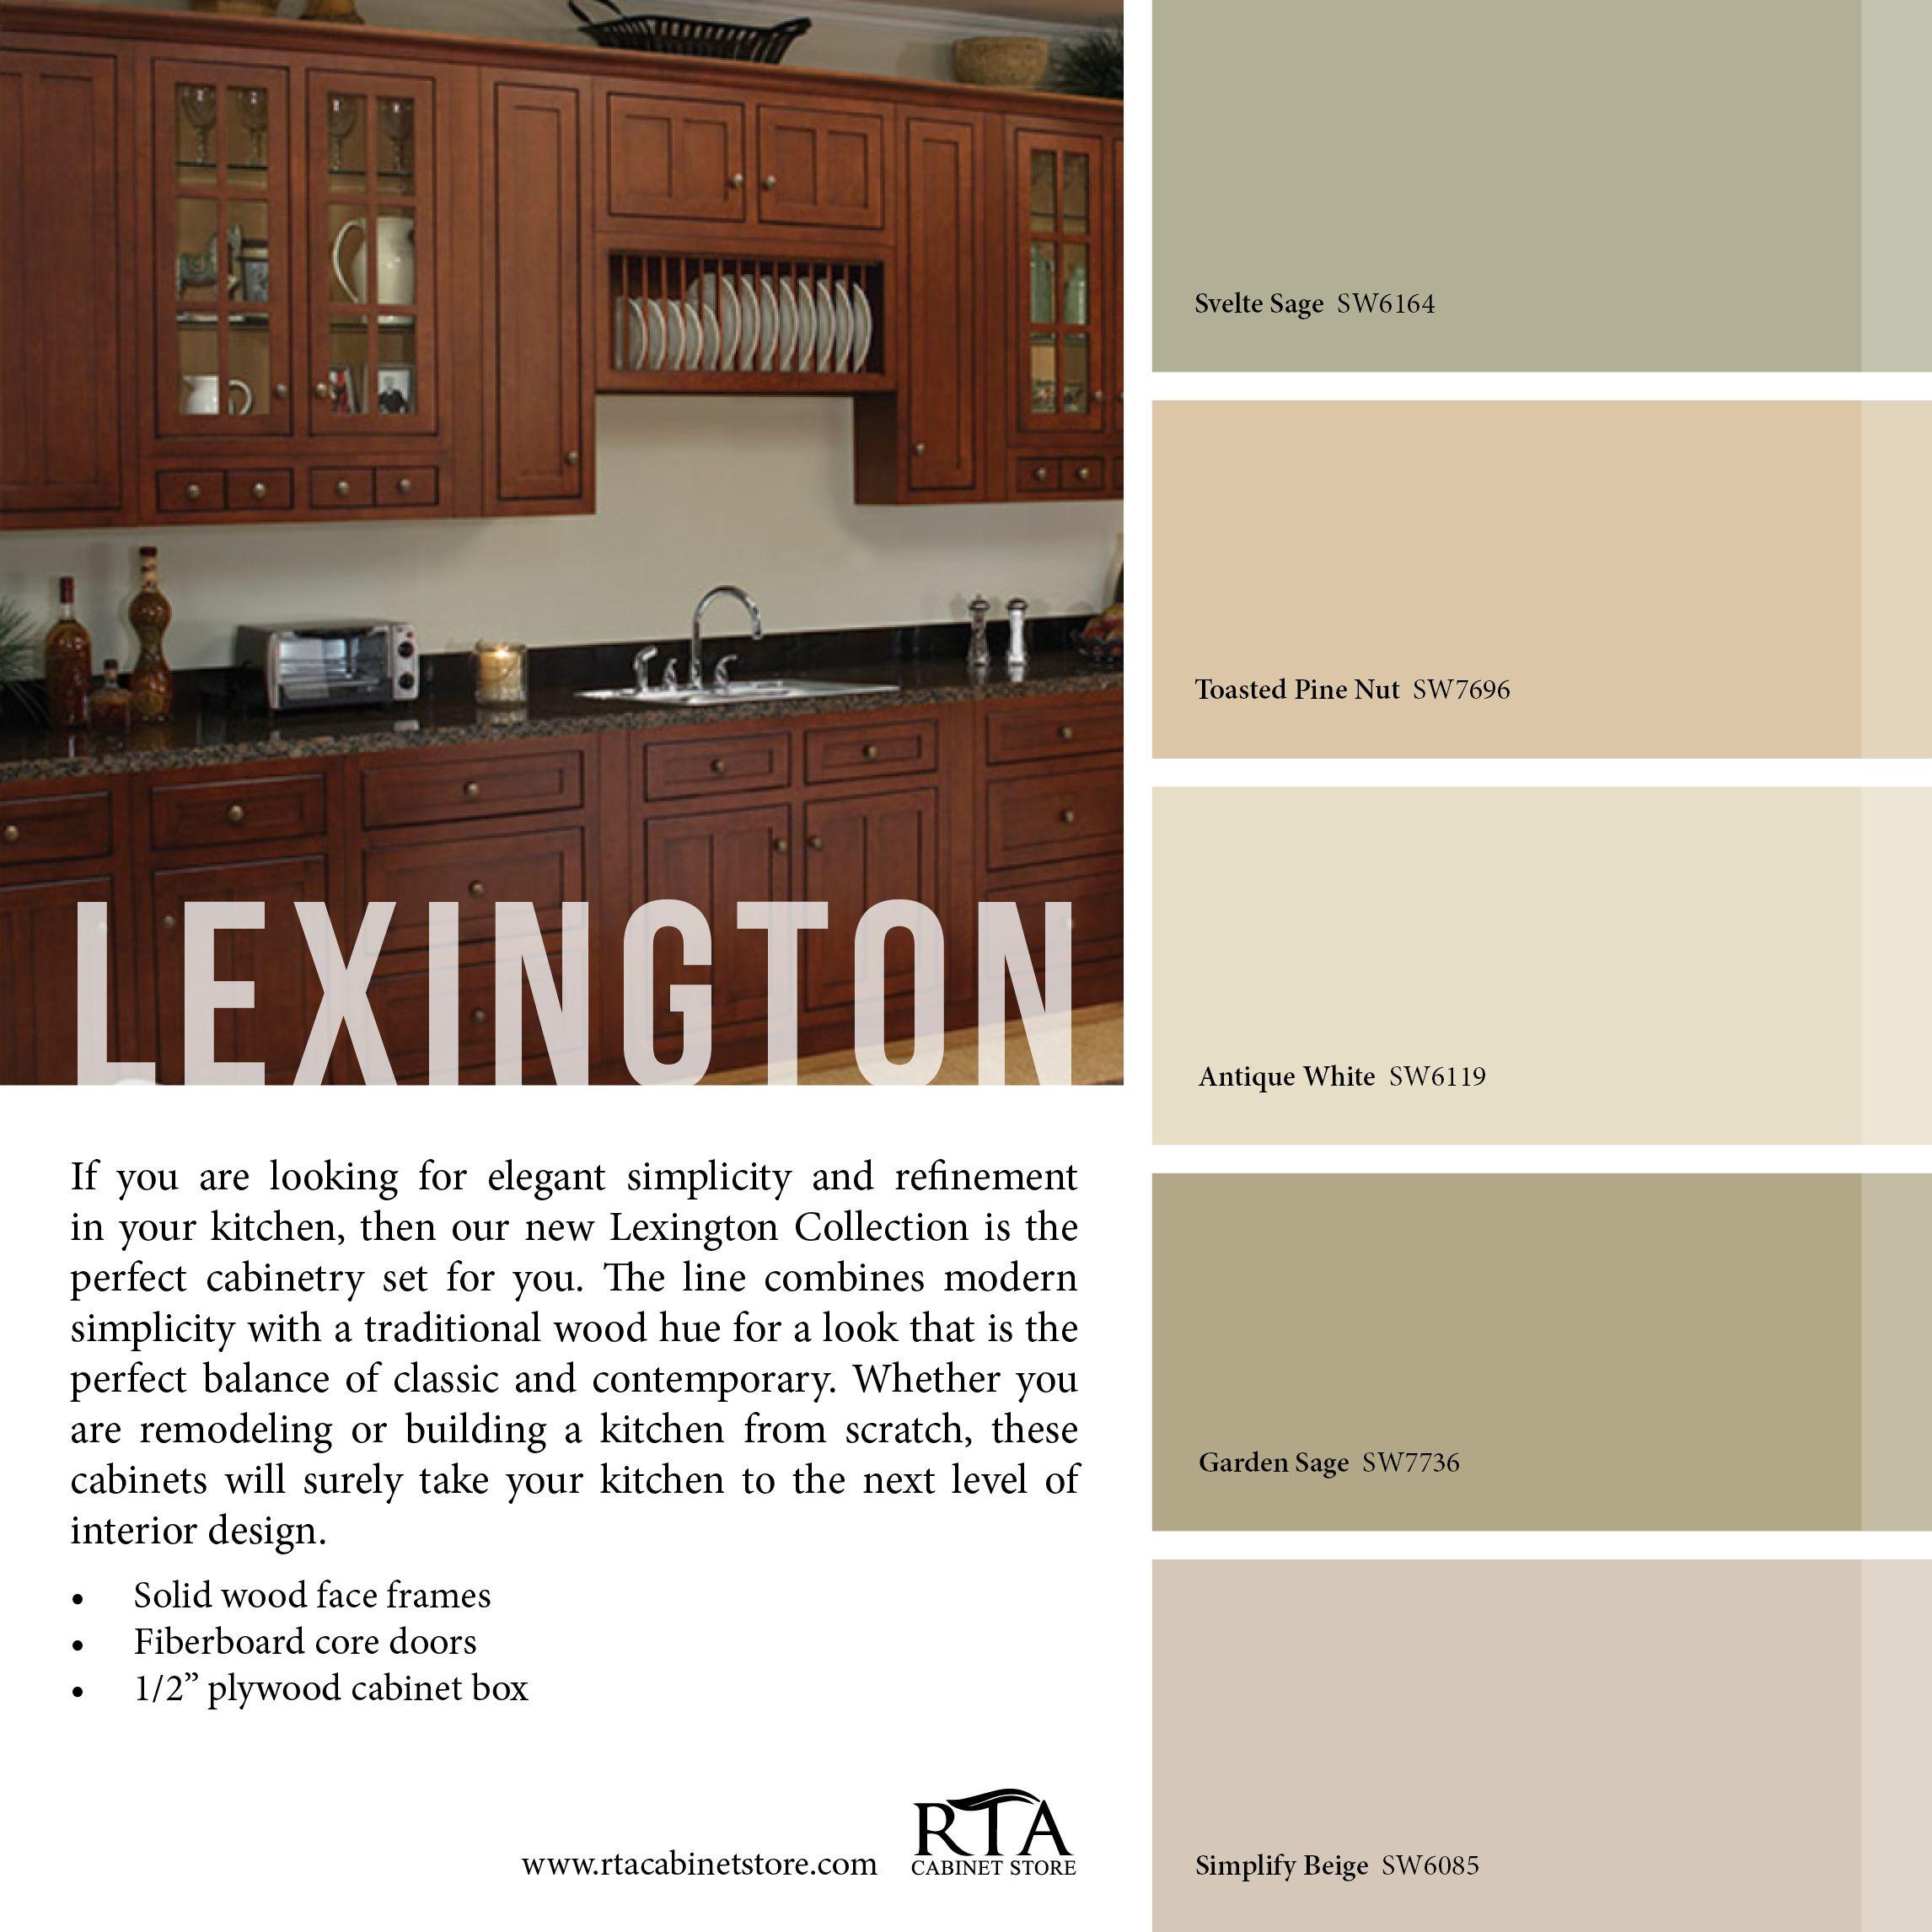 Color Palette To Go With Our Lexington Cabinet Line Online Kitchen Design Buy Kitchen Cabinets Online Kitchen Tools Design